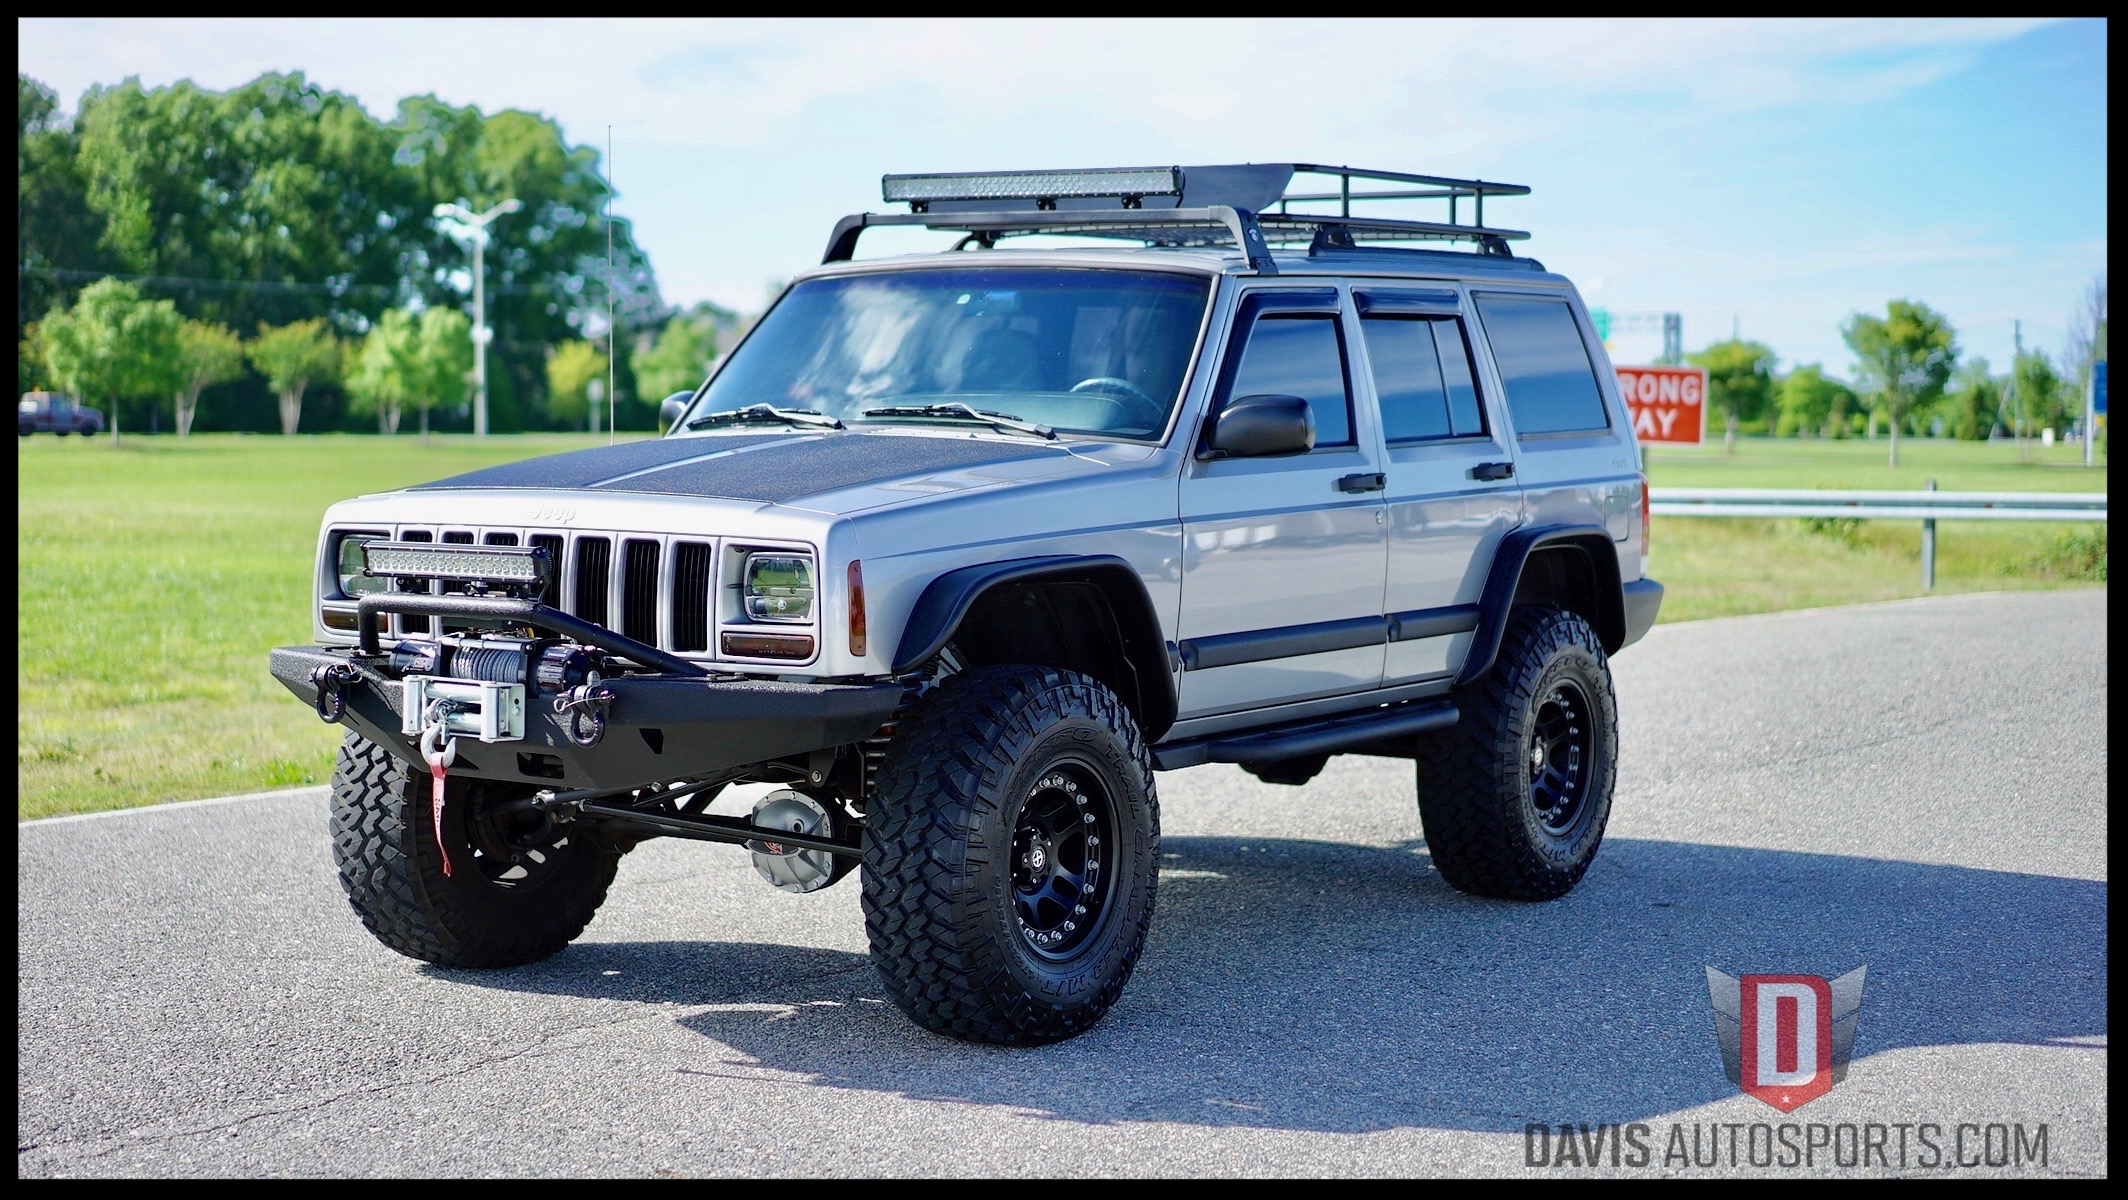 built cherokee old davis autosports built cherokee old davis autosports